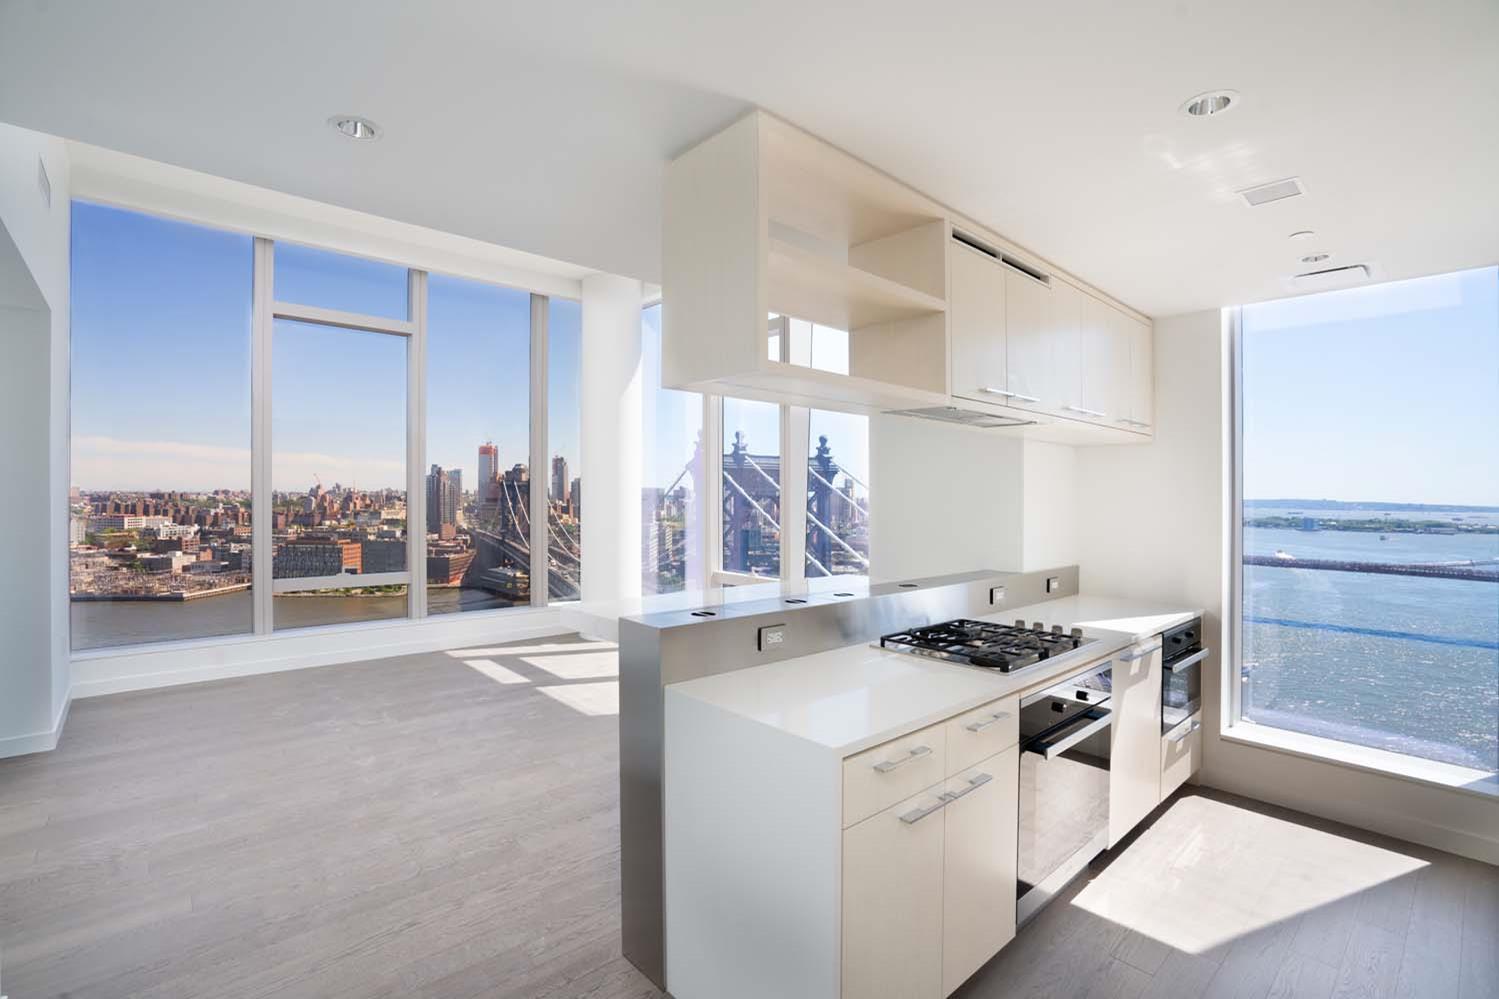 252 South Street, Apt 24-D, Manhattan, New York 10002